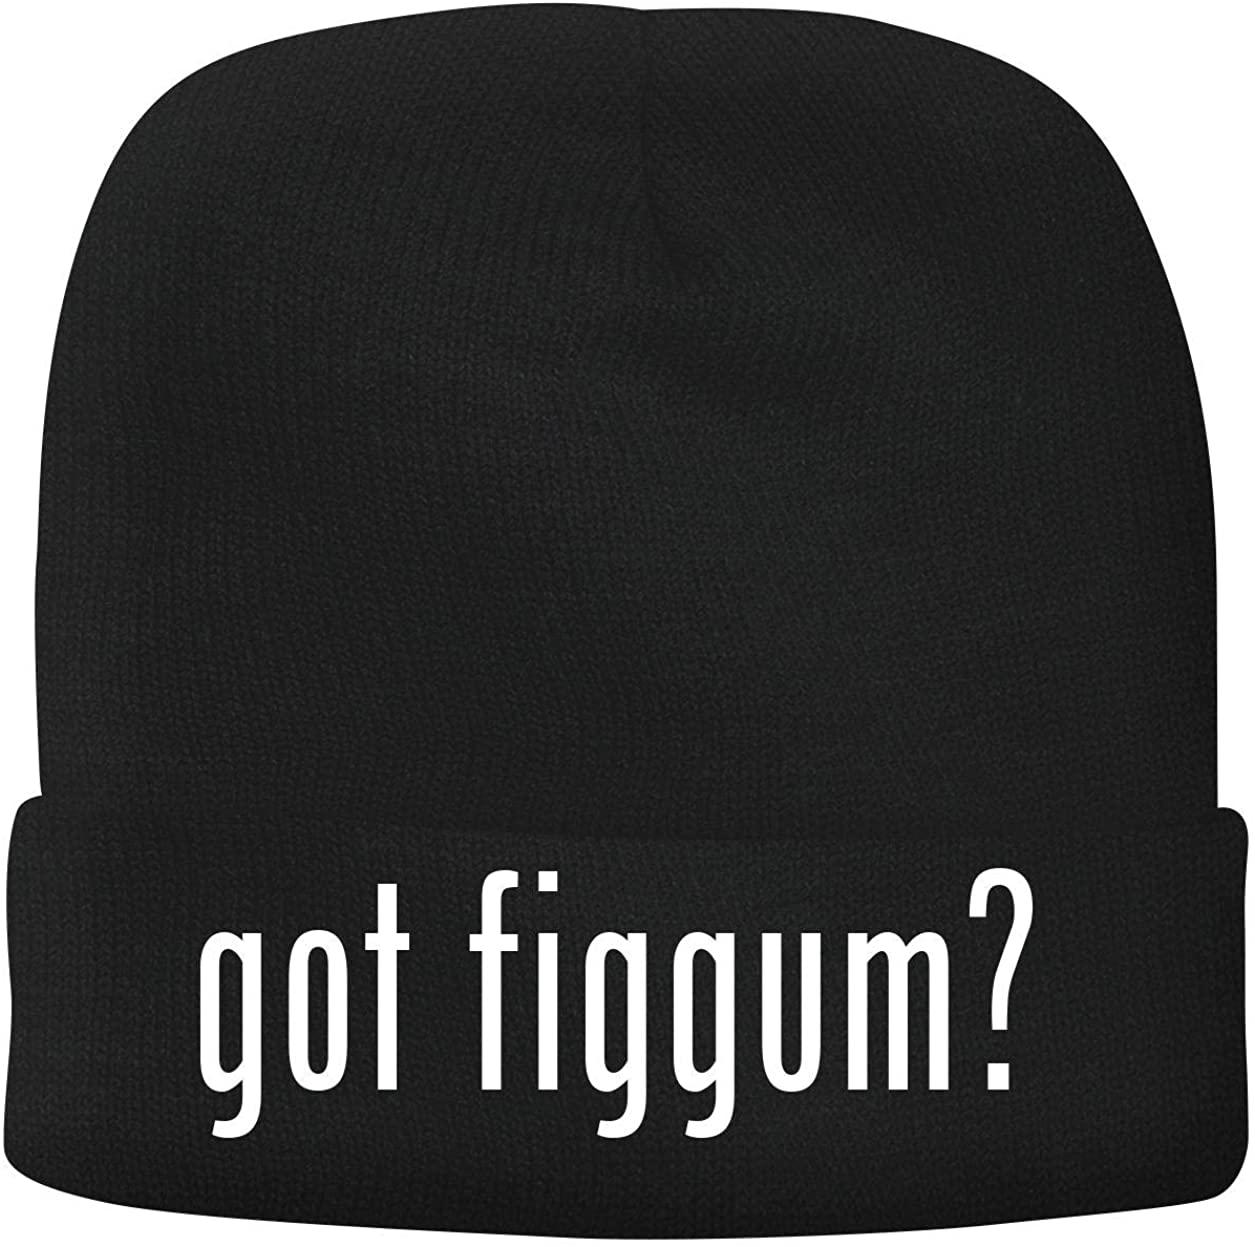 BH Cool Designs got Figgum? - Men's Soft & Comfortable Beanie Hat Cap